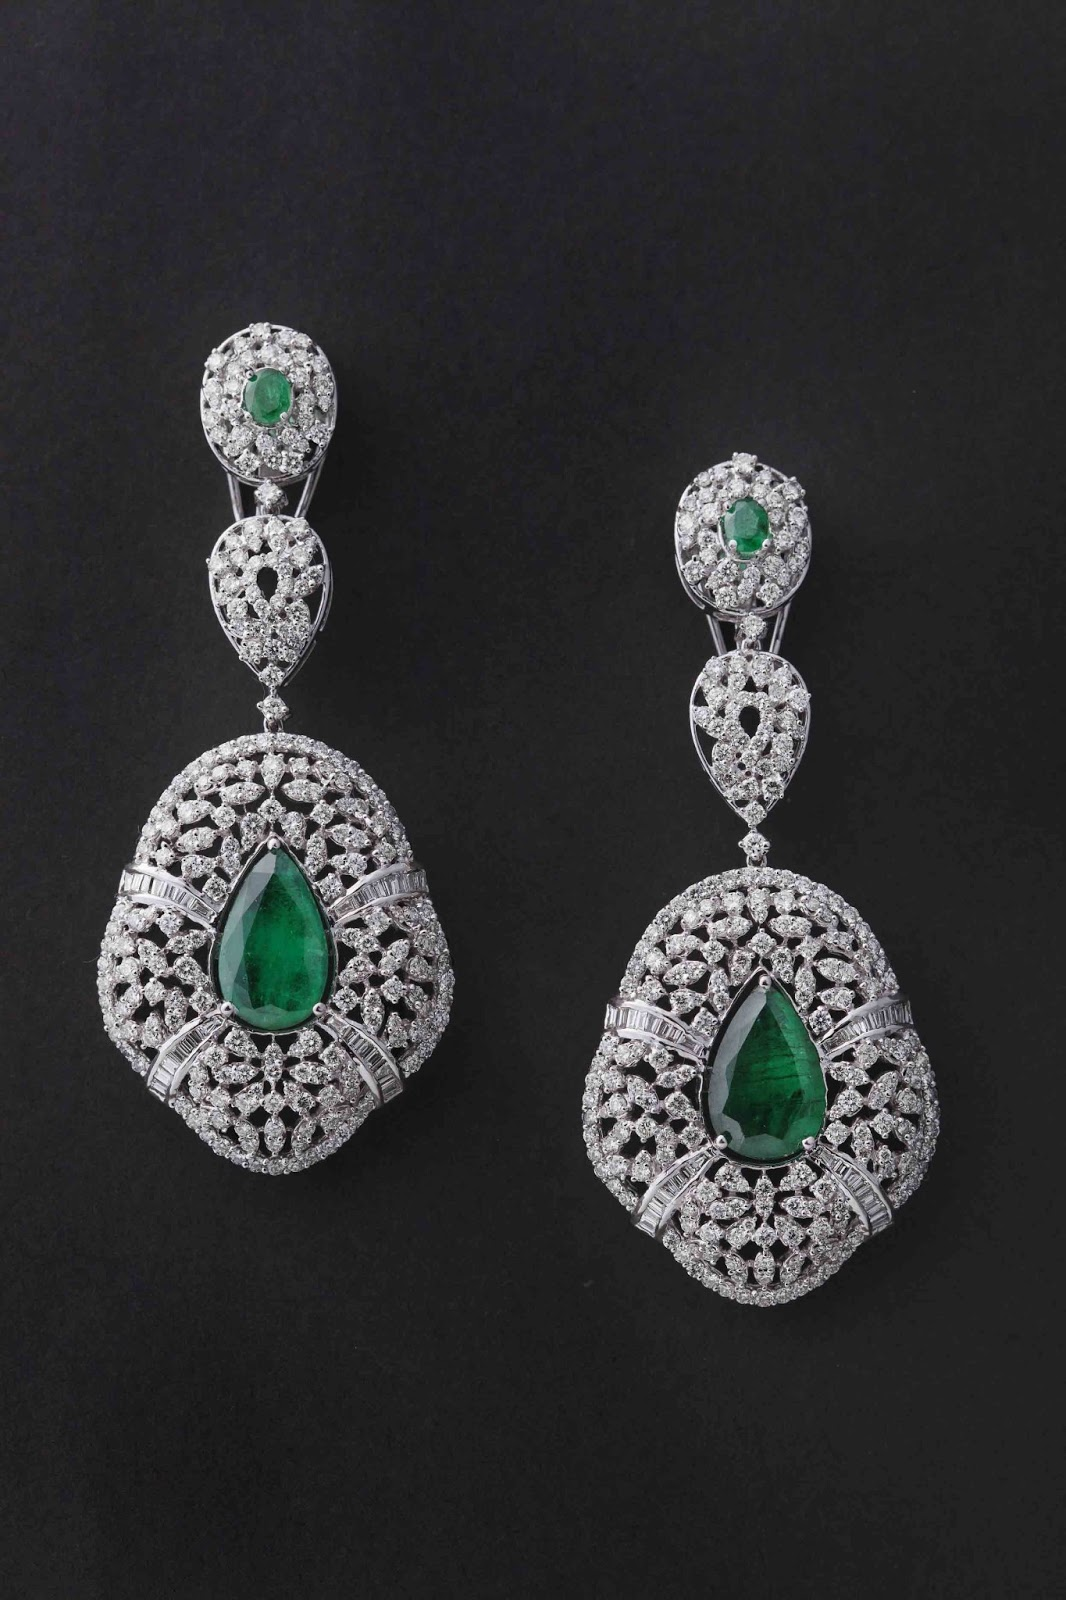 Diamond Jewellery Ornaments Platinum As Jewellery With